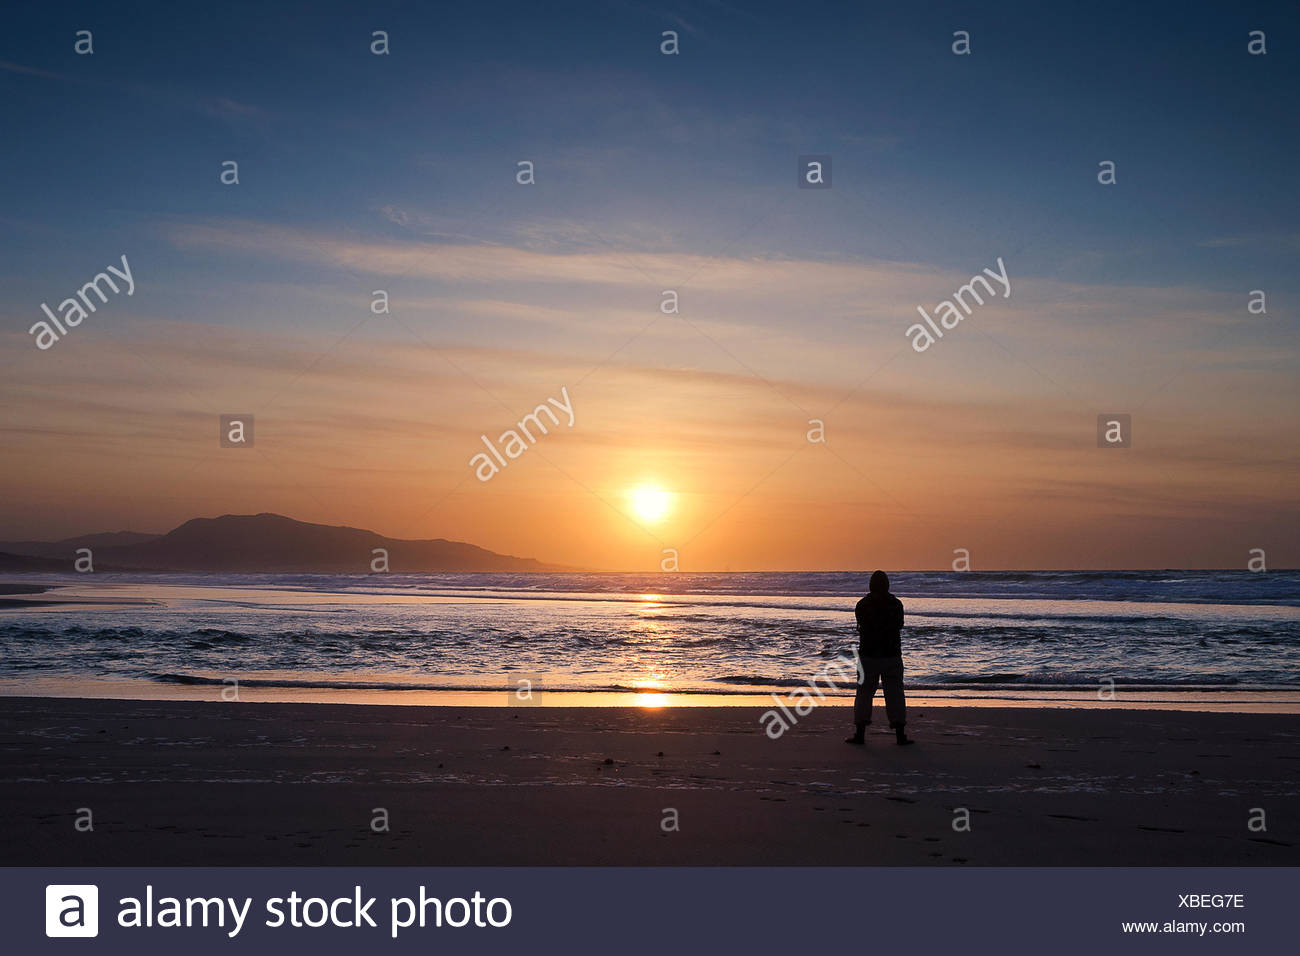 349b3c8909 Sunset On Beach Tarifa Spain Stock Photos & Sunset On Beach Tarifa ...